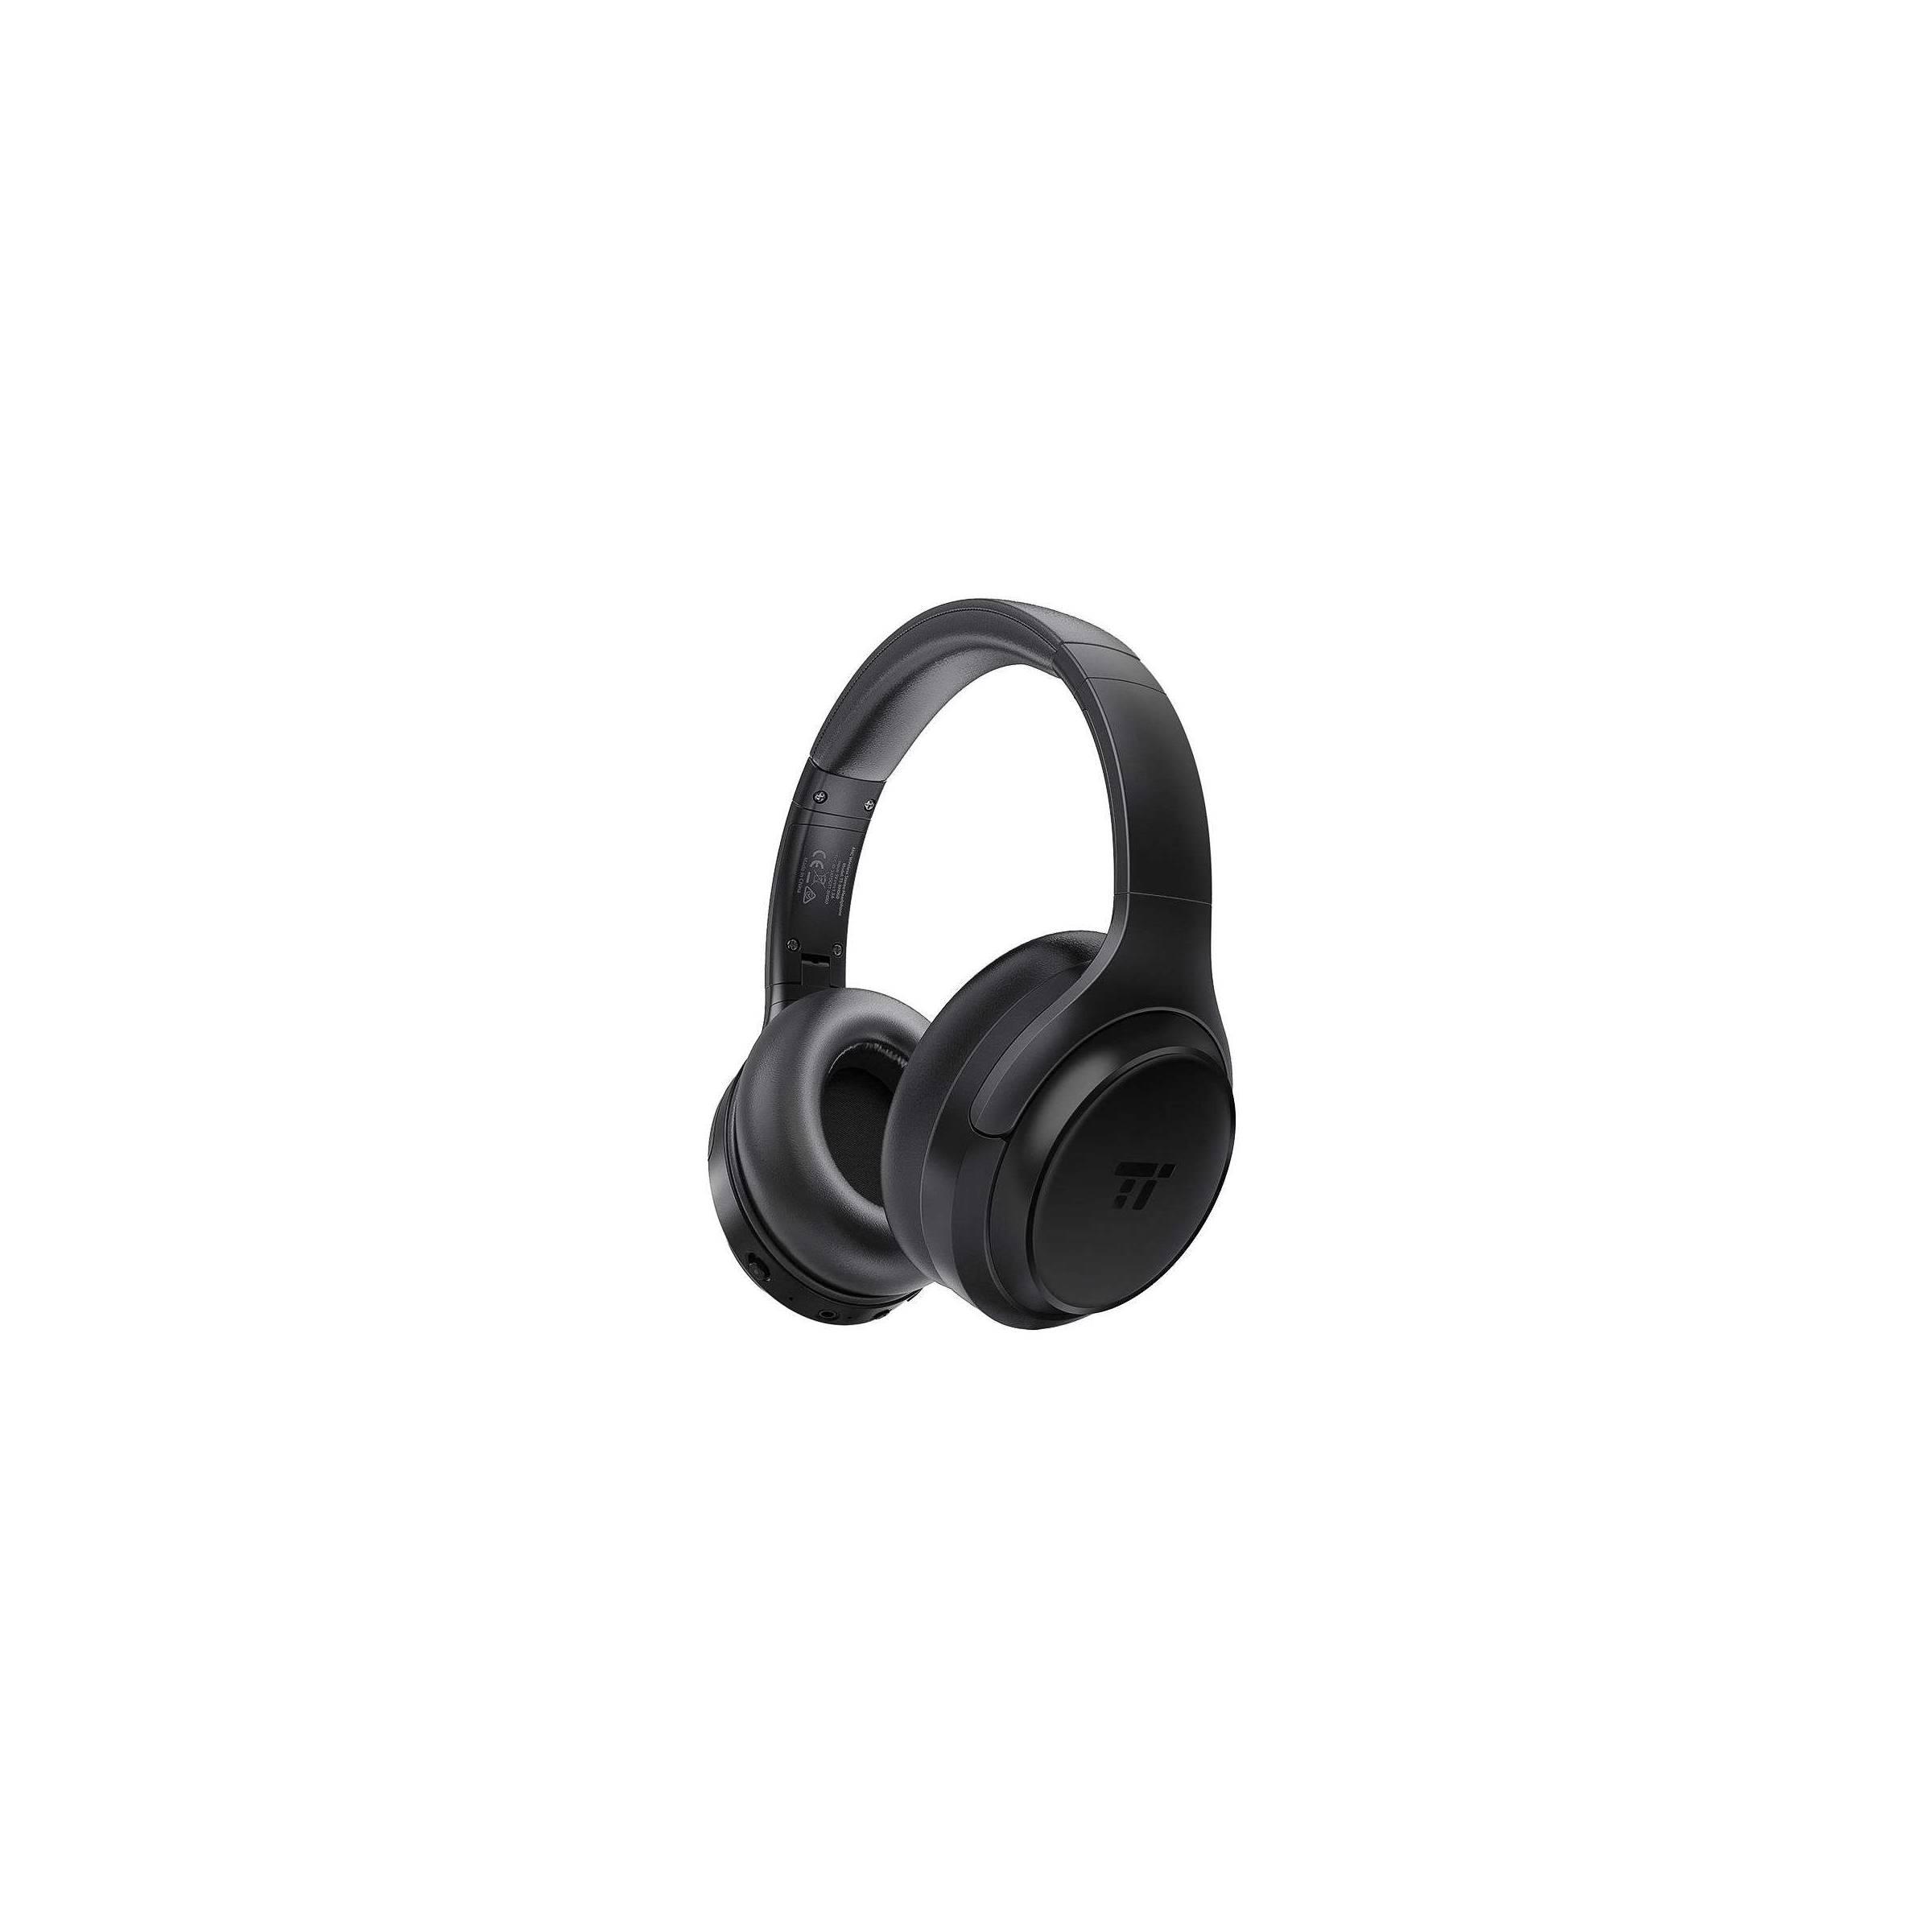 taotronics Taotronics soundsurge 60 anc trådløs noise cancelling headset på mackabler.dk